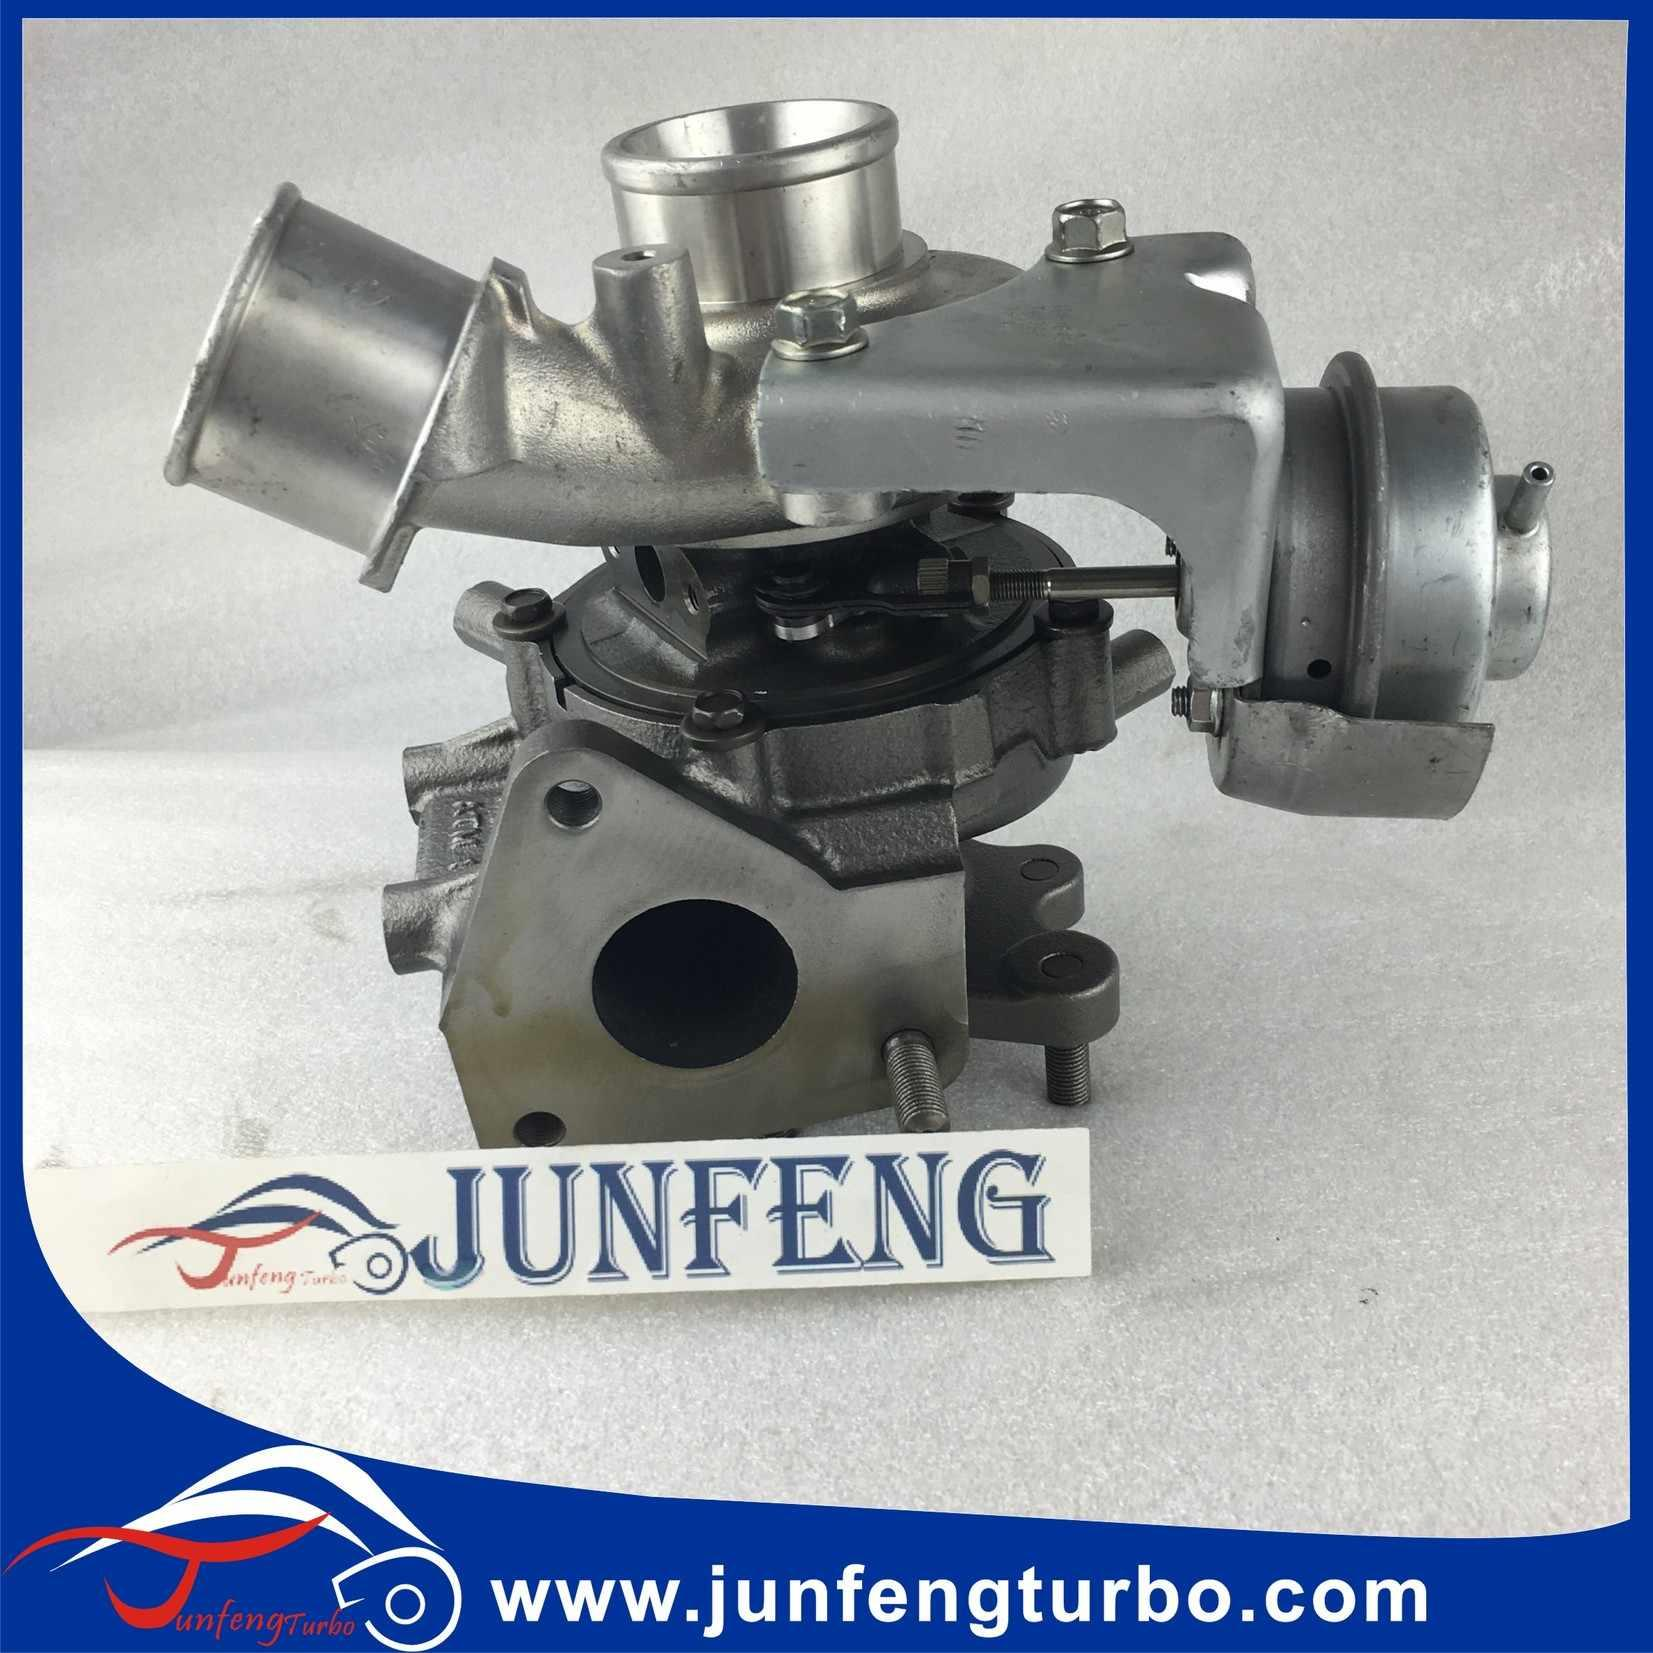 TD03L4 turbo 49693-47001 49131-06703 turbocharger 1515A219 MITSUBISHI 4N13